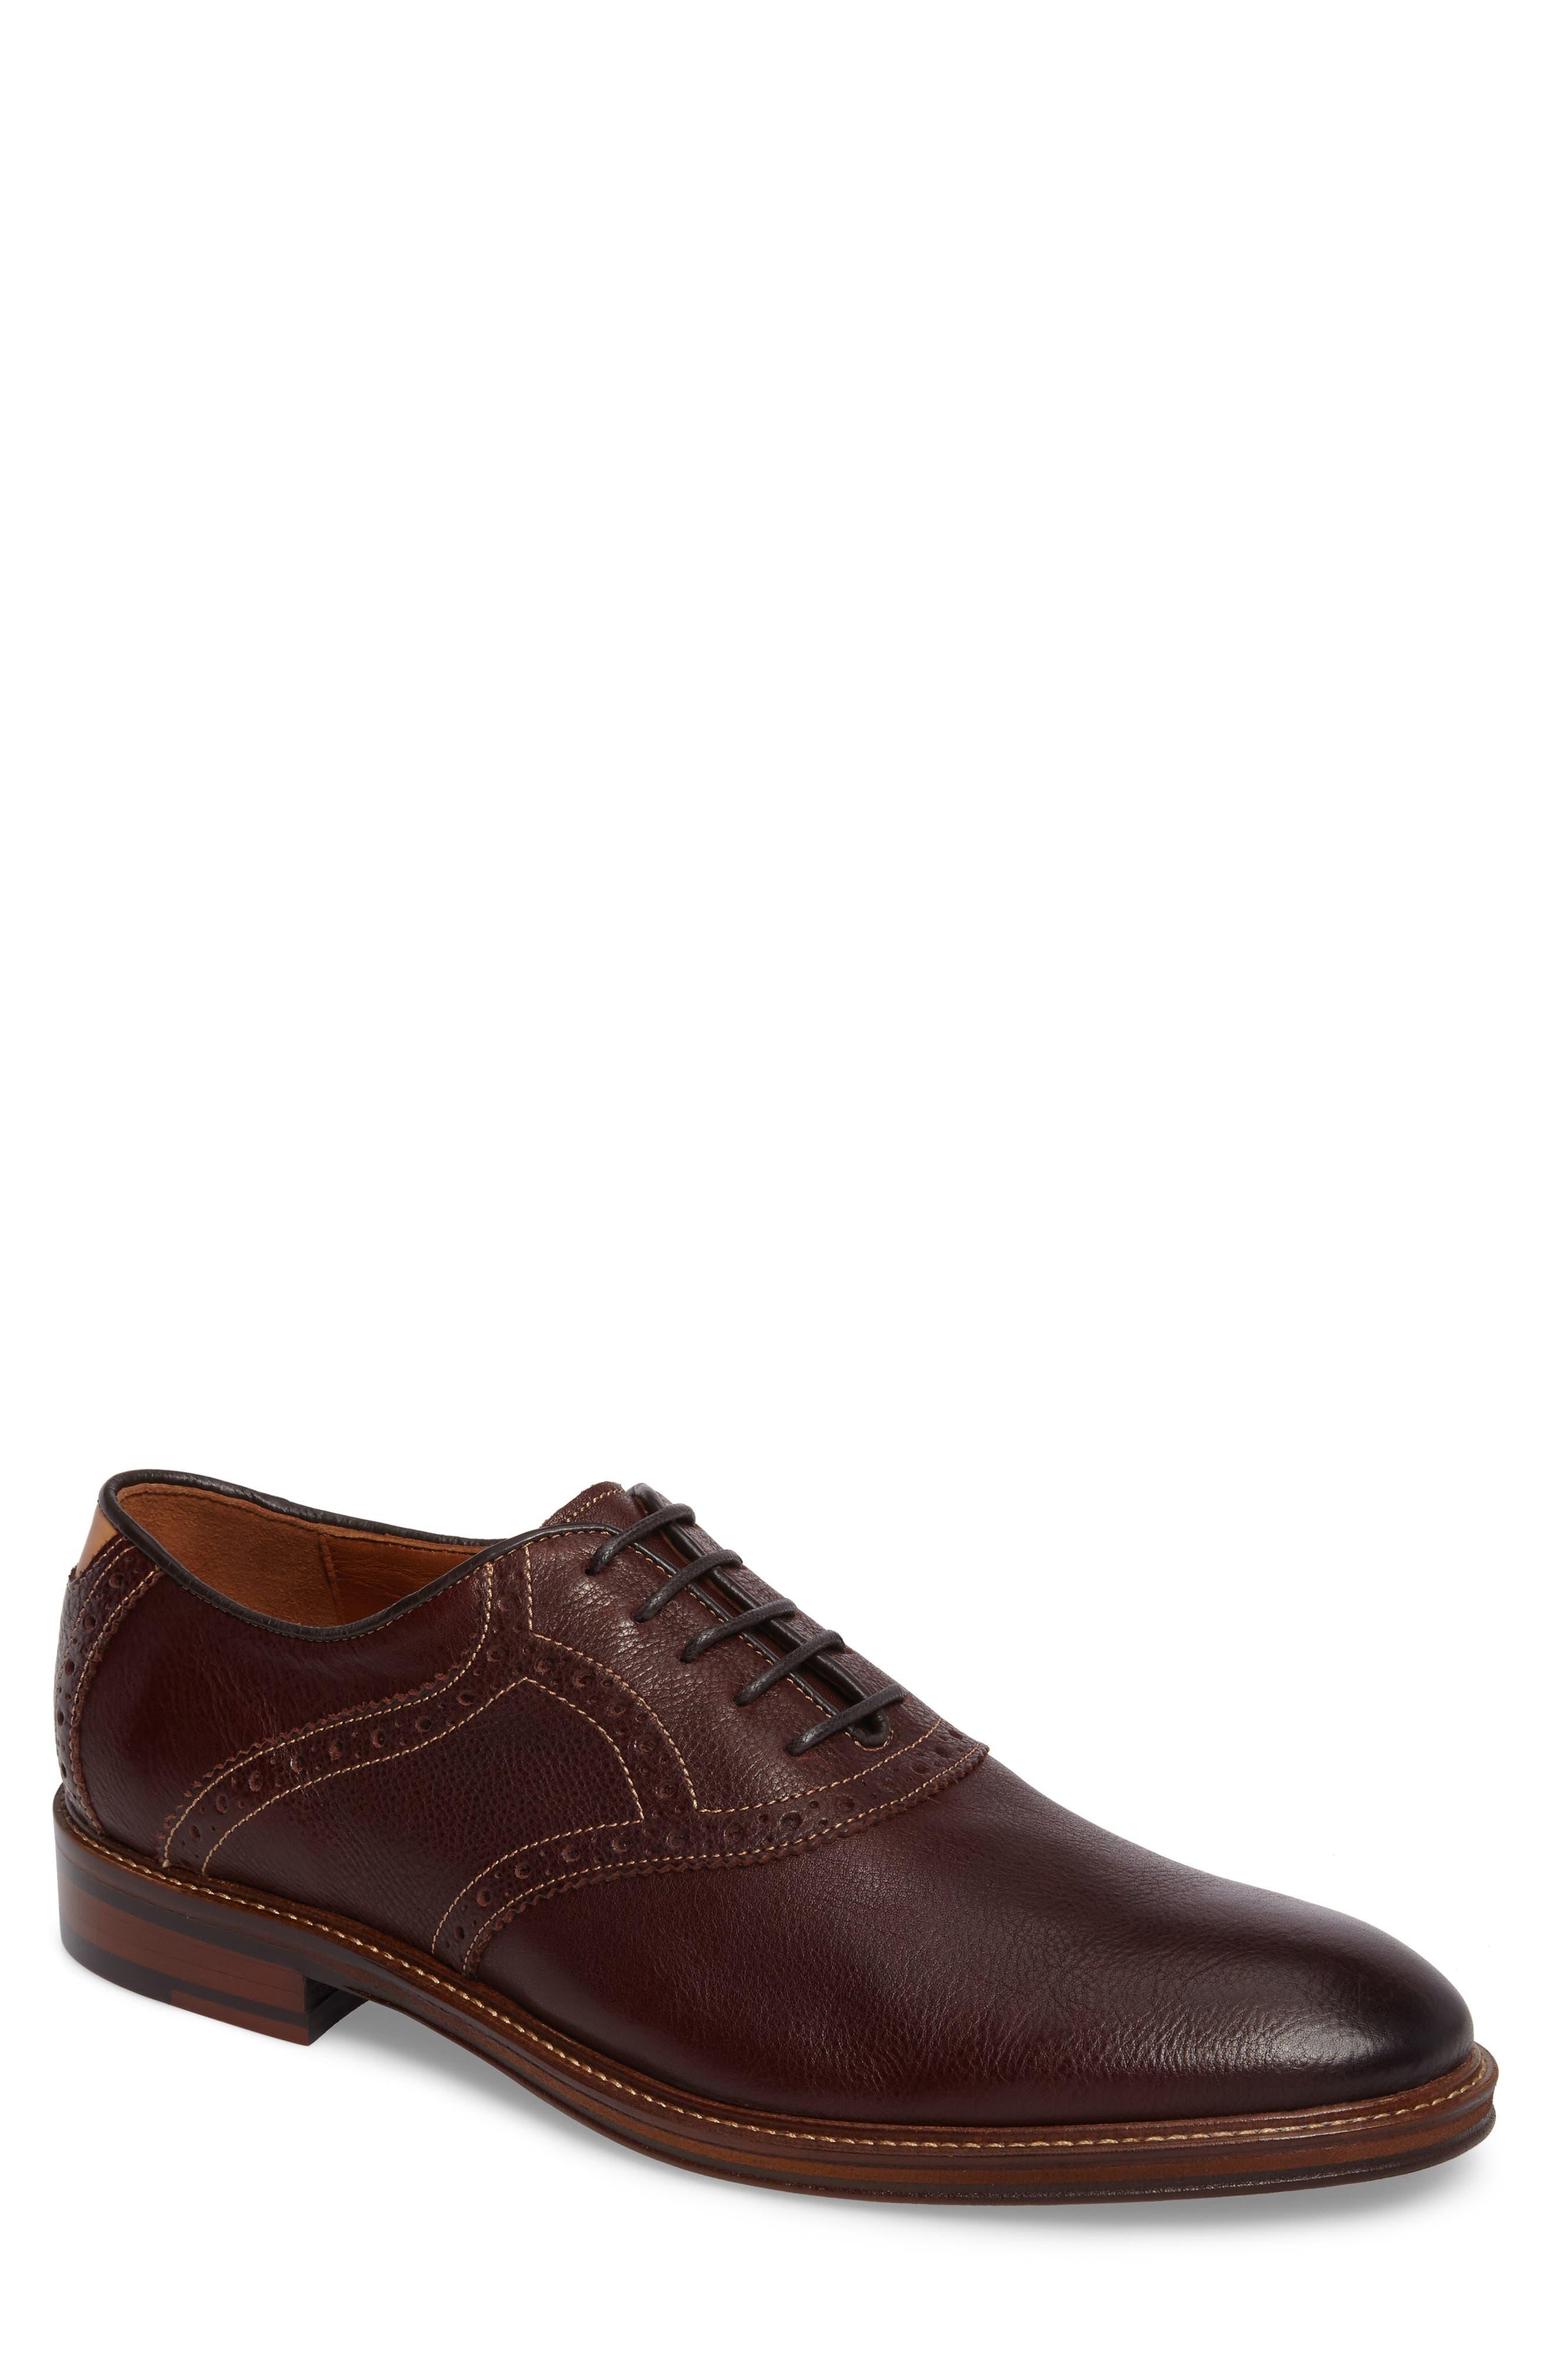 Alternate Image 1 Selected - Johnston & Murphy Warner Saddle Shoe (Men)